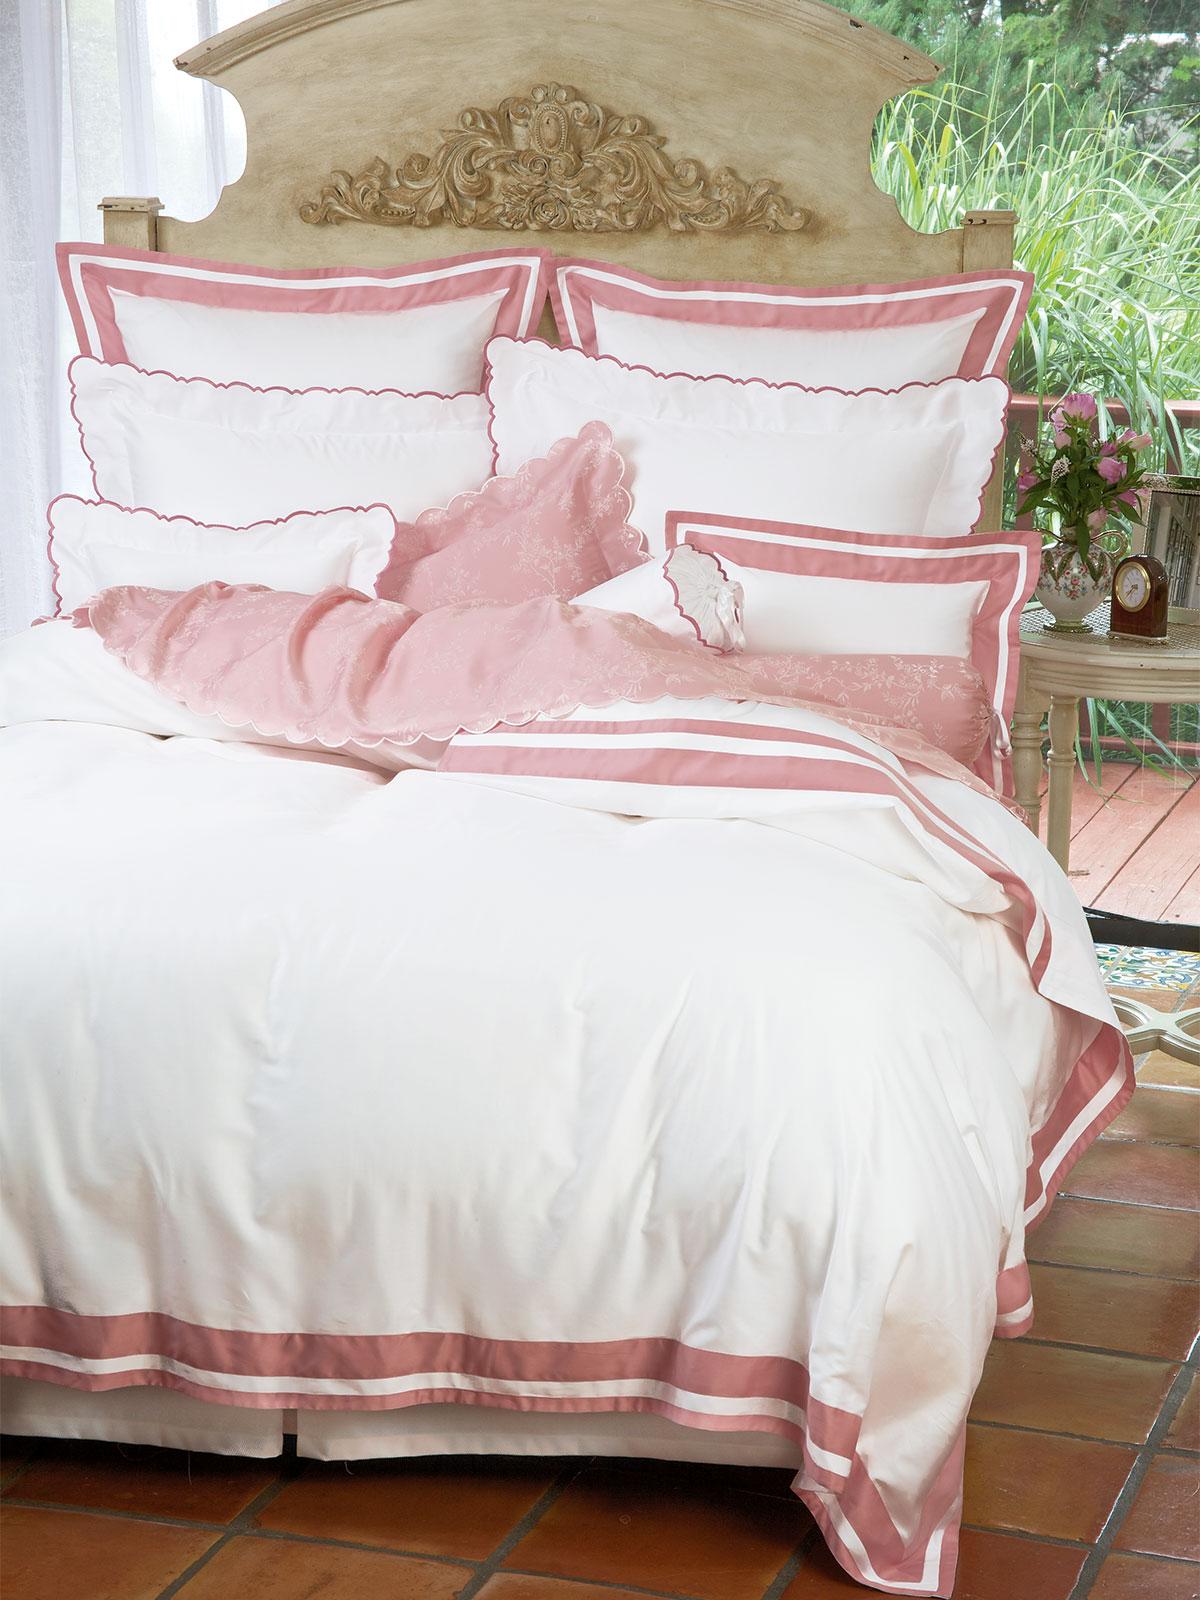 vis a vis fine bed linens luxury bedding italian bed linens schweitzer linen. Black Bedroom Furniture Sets. Home Design Ideas